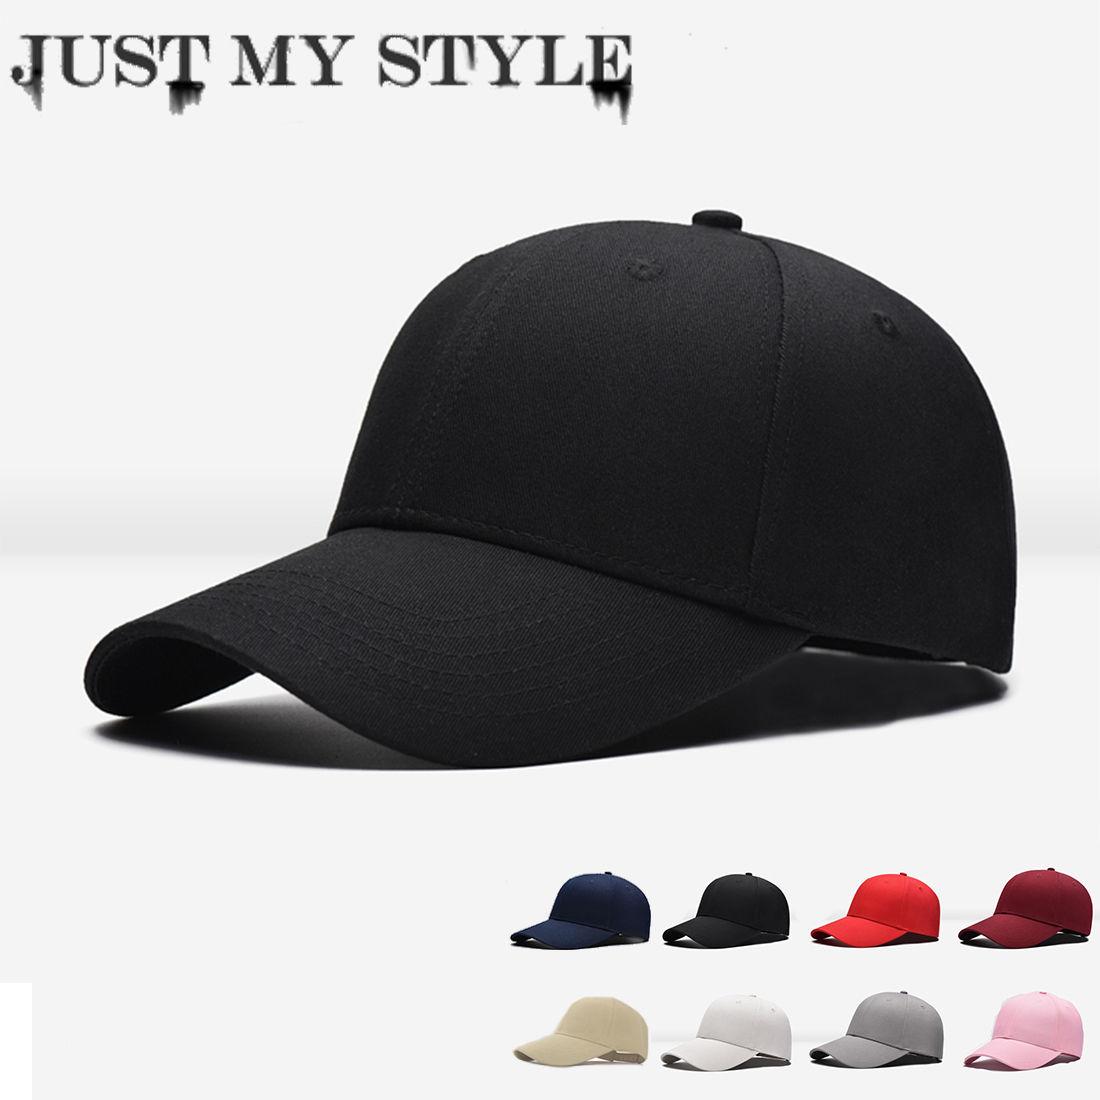 23f43833f83 Details about Men Women New Black Baseball Cap Snapback Hat Hip-Hop  Adjustable Bboy Caps